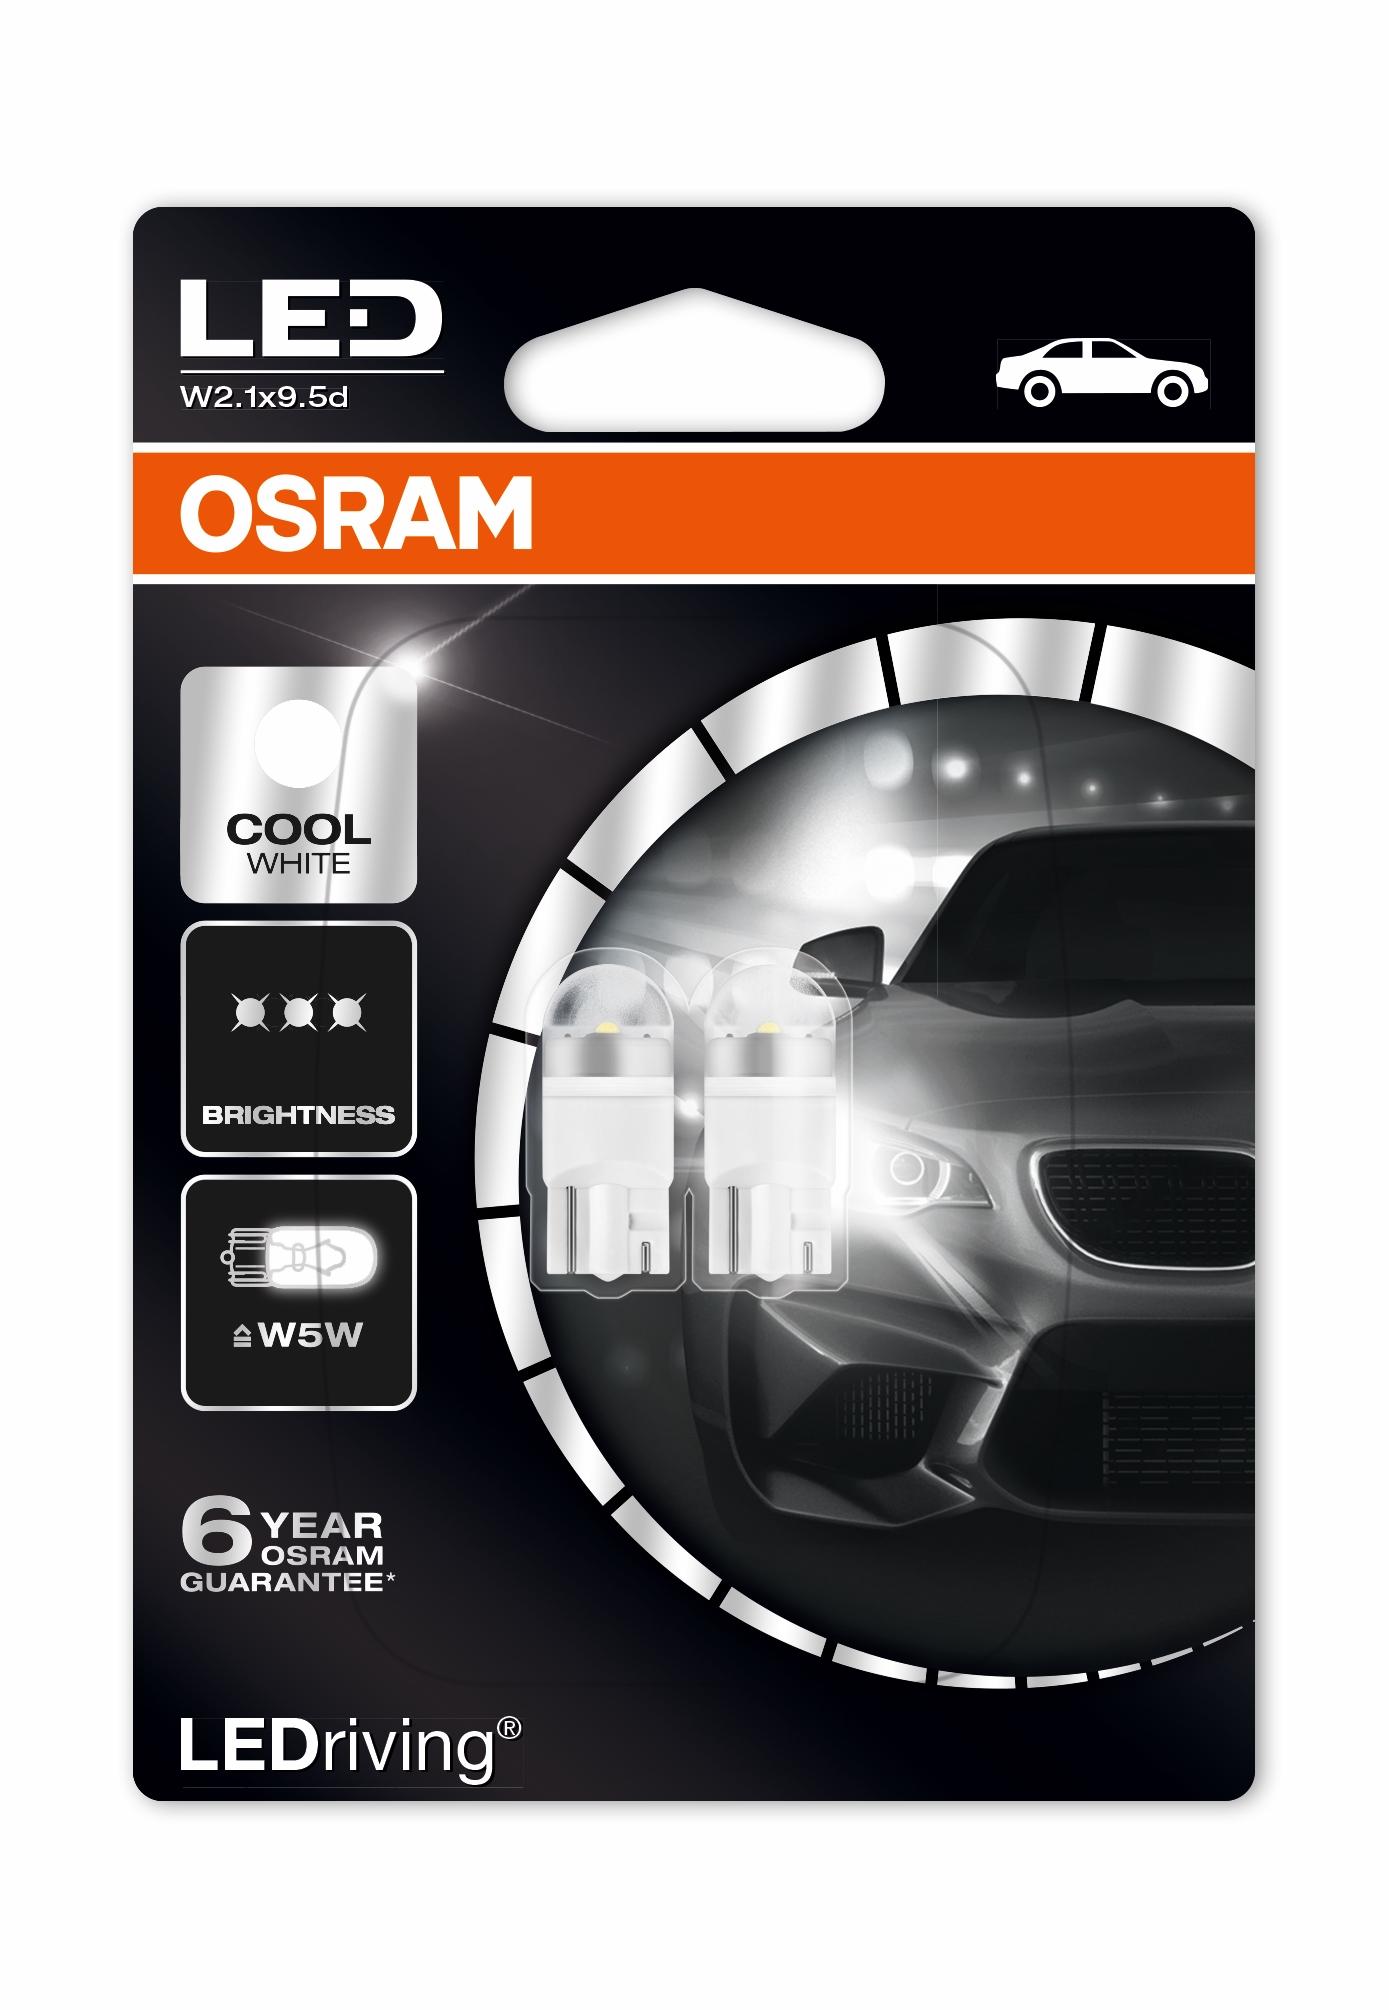 2 x osram w5w 501 t10 led 6000k high quality new. Black Bedroom Furniture Sets. Home Design Ideas